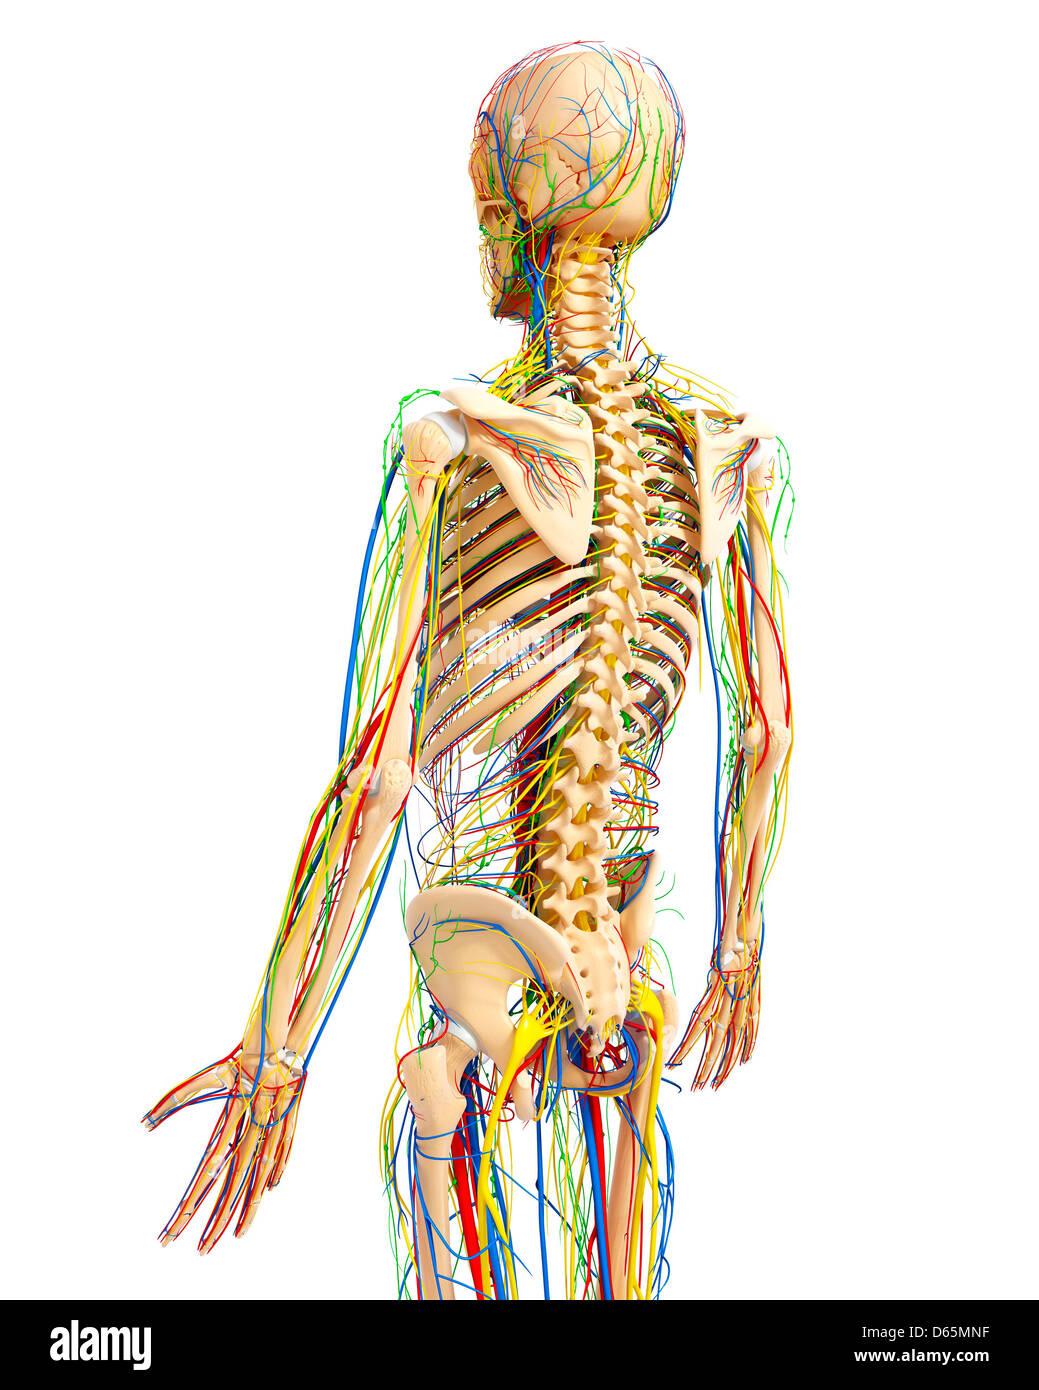 Anatomy Rear View Back Human Stock Photos Anatomy Rear View Back